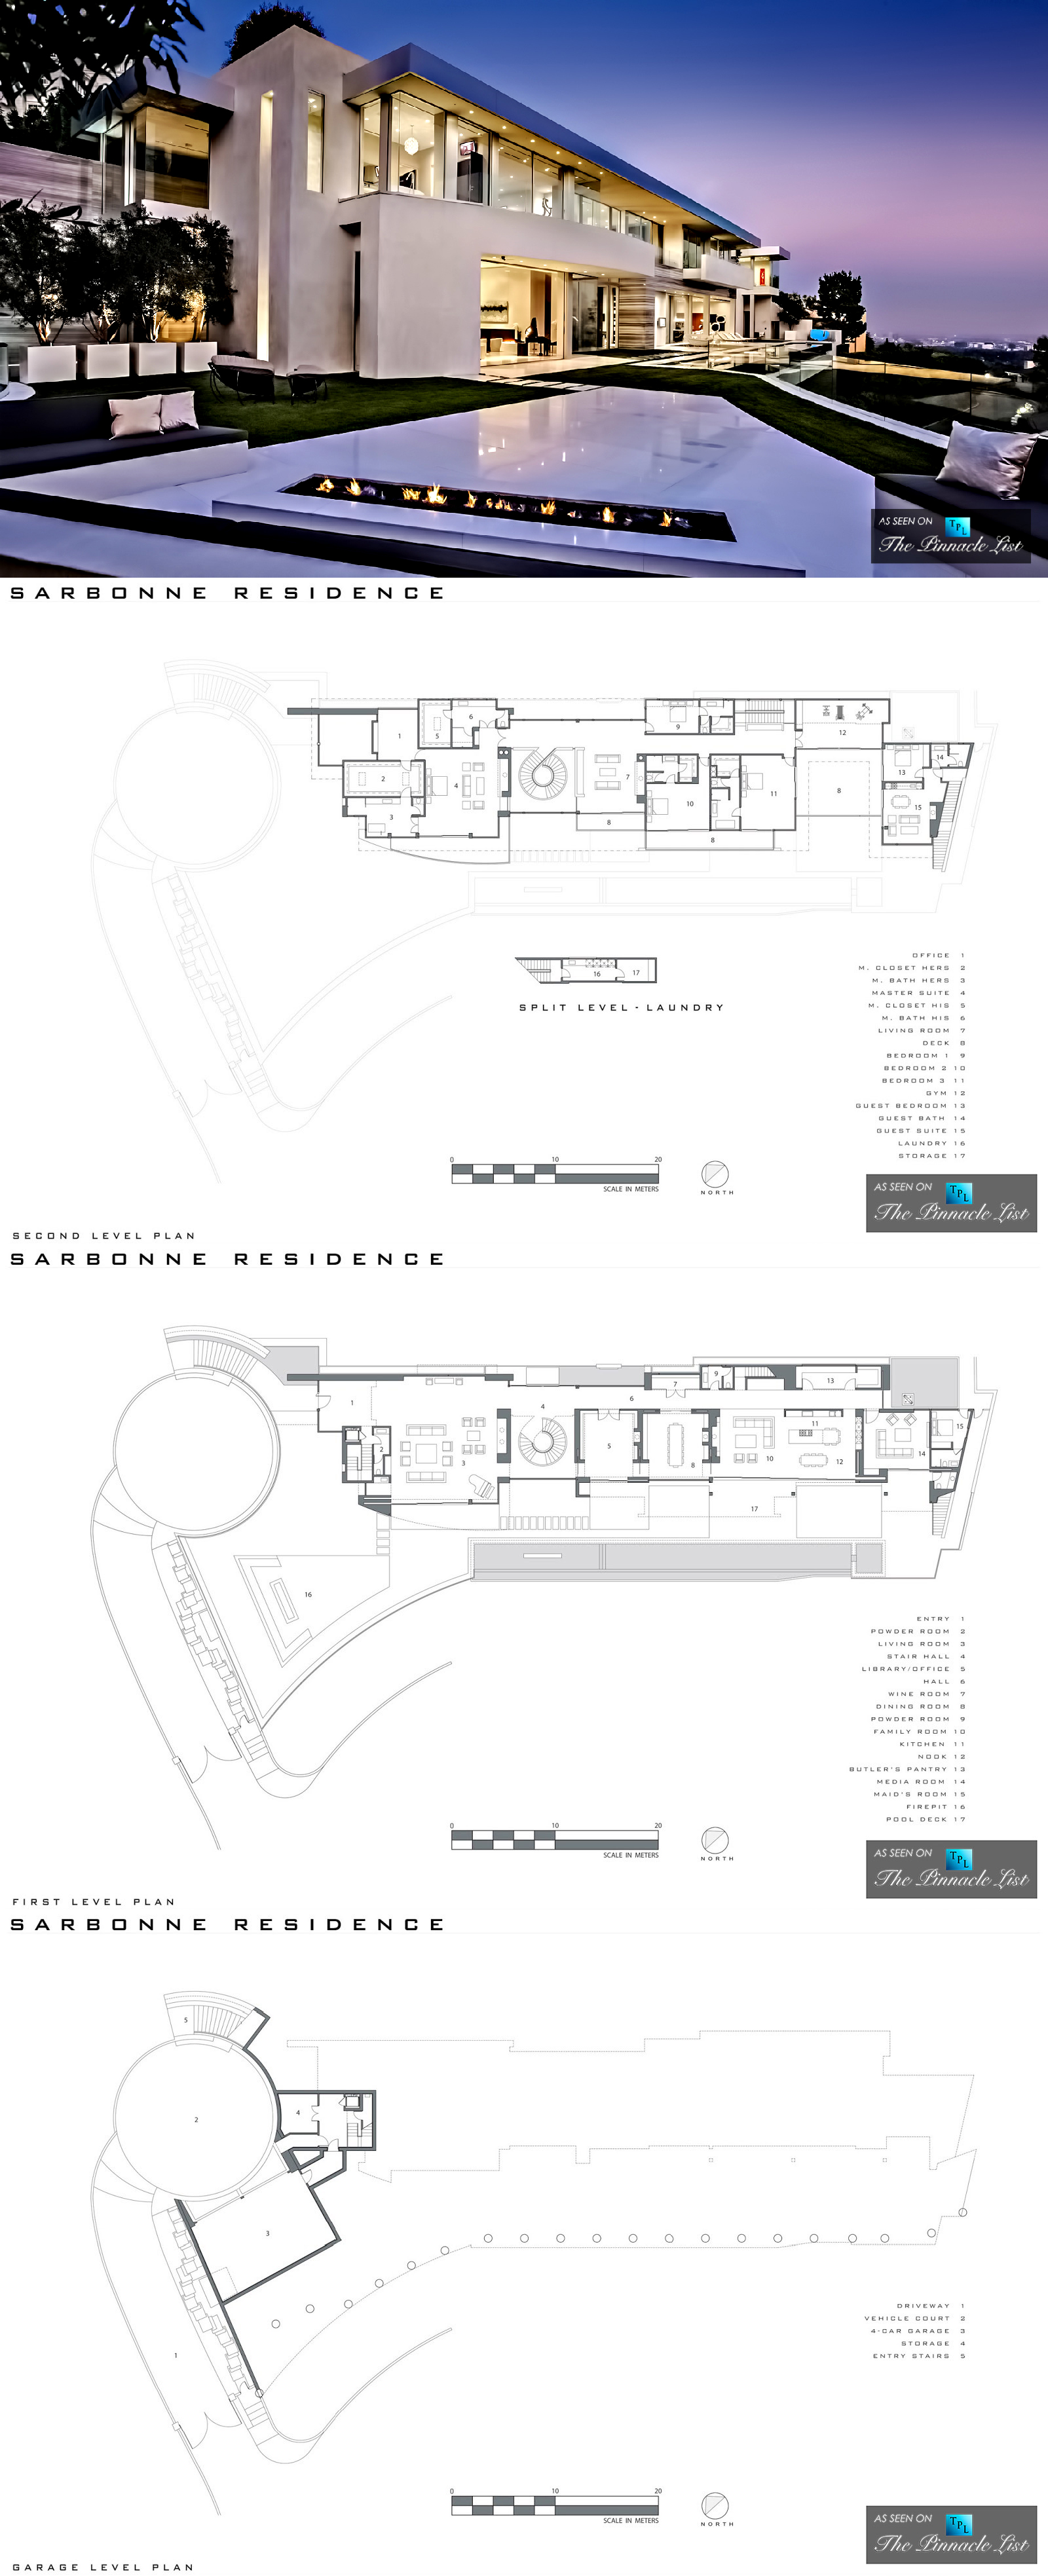 Bel Air Luxury Residence 755 Sarbonne Rd Los Angeles Ca Usa House Plans Mansion Mansion Floor Plan Luxury Floor Plans